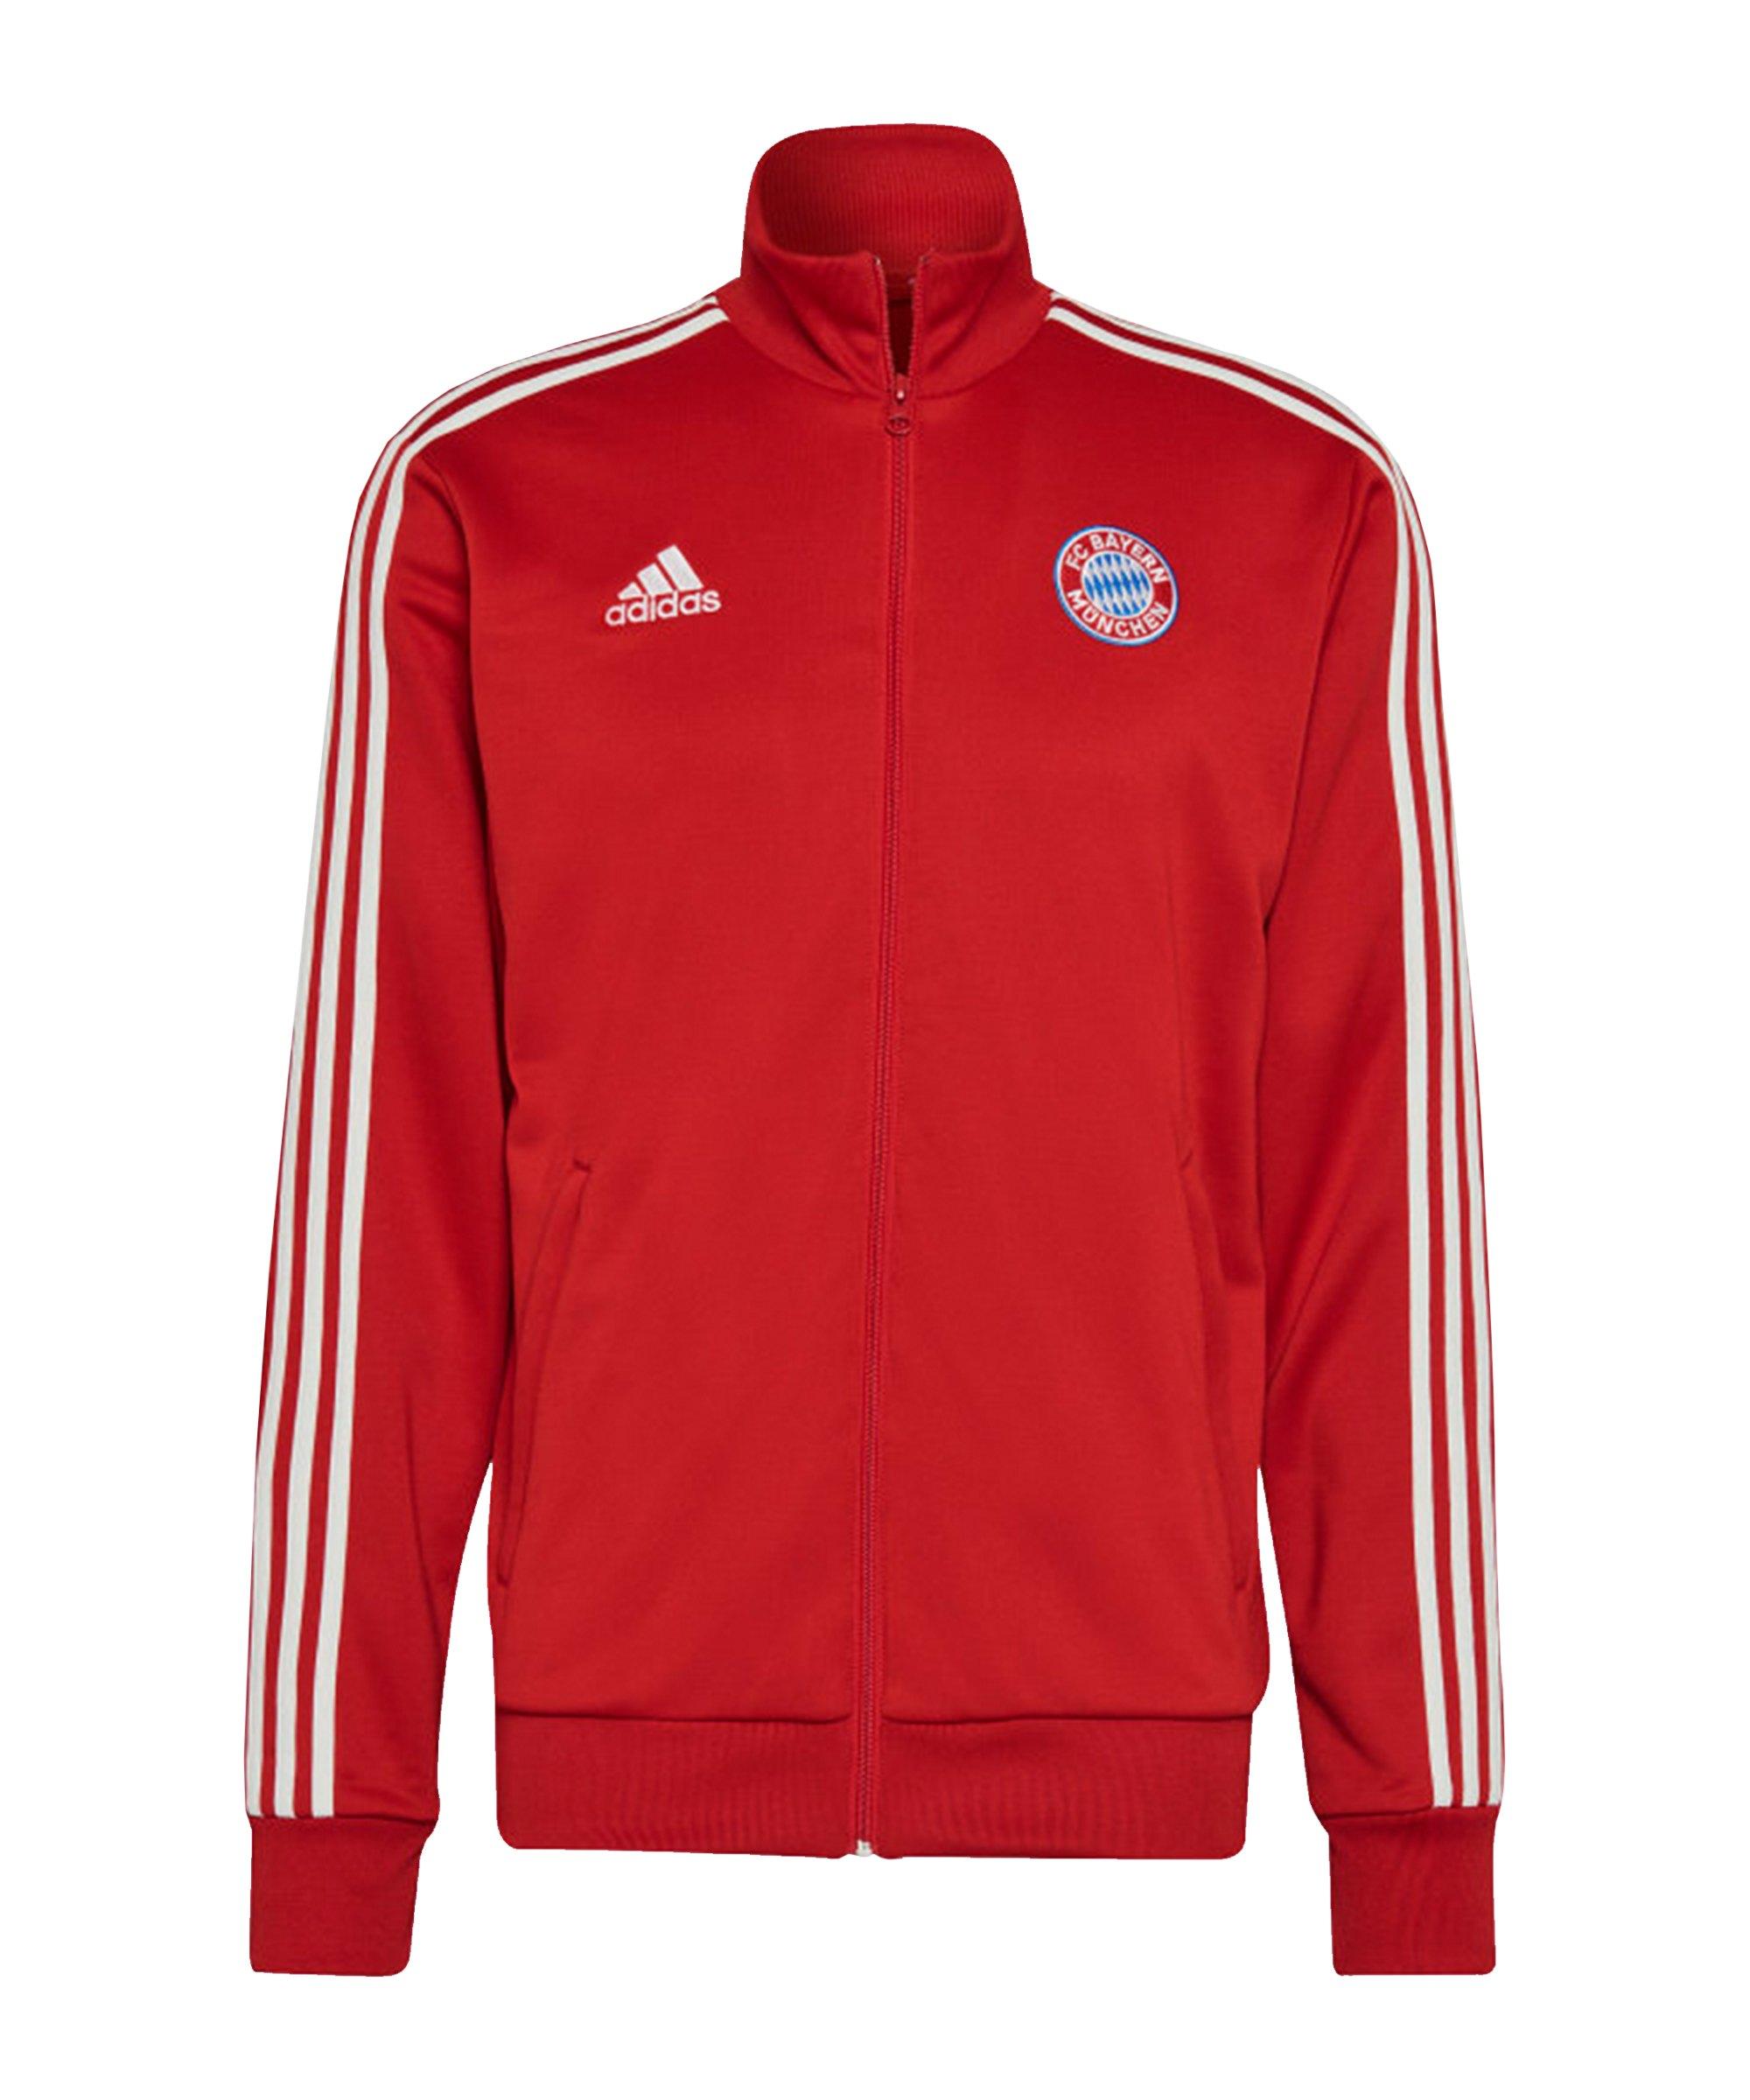 adidas FC Bayern München 3 Stripes Track Top Rot - rot